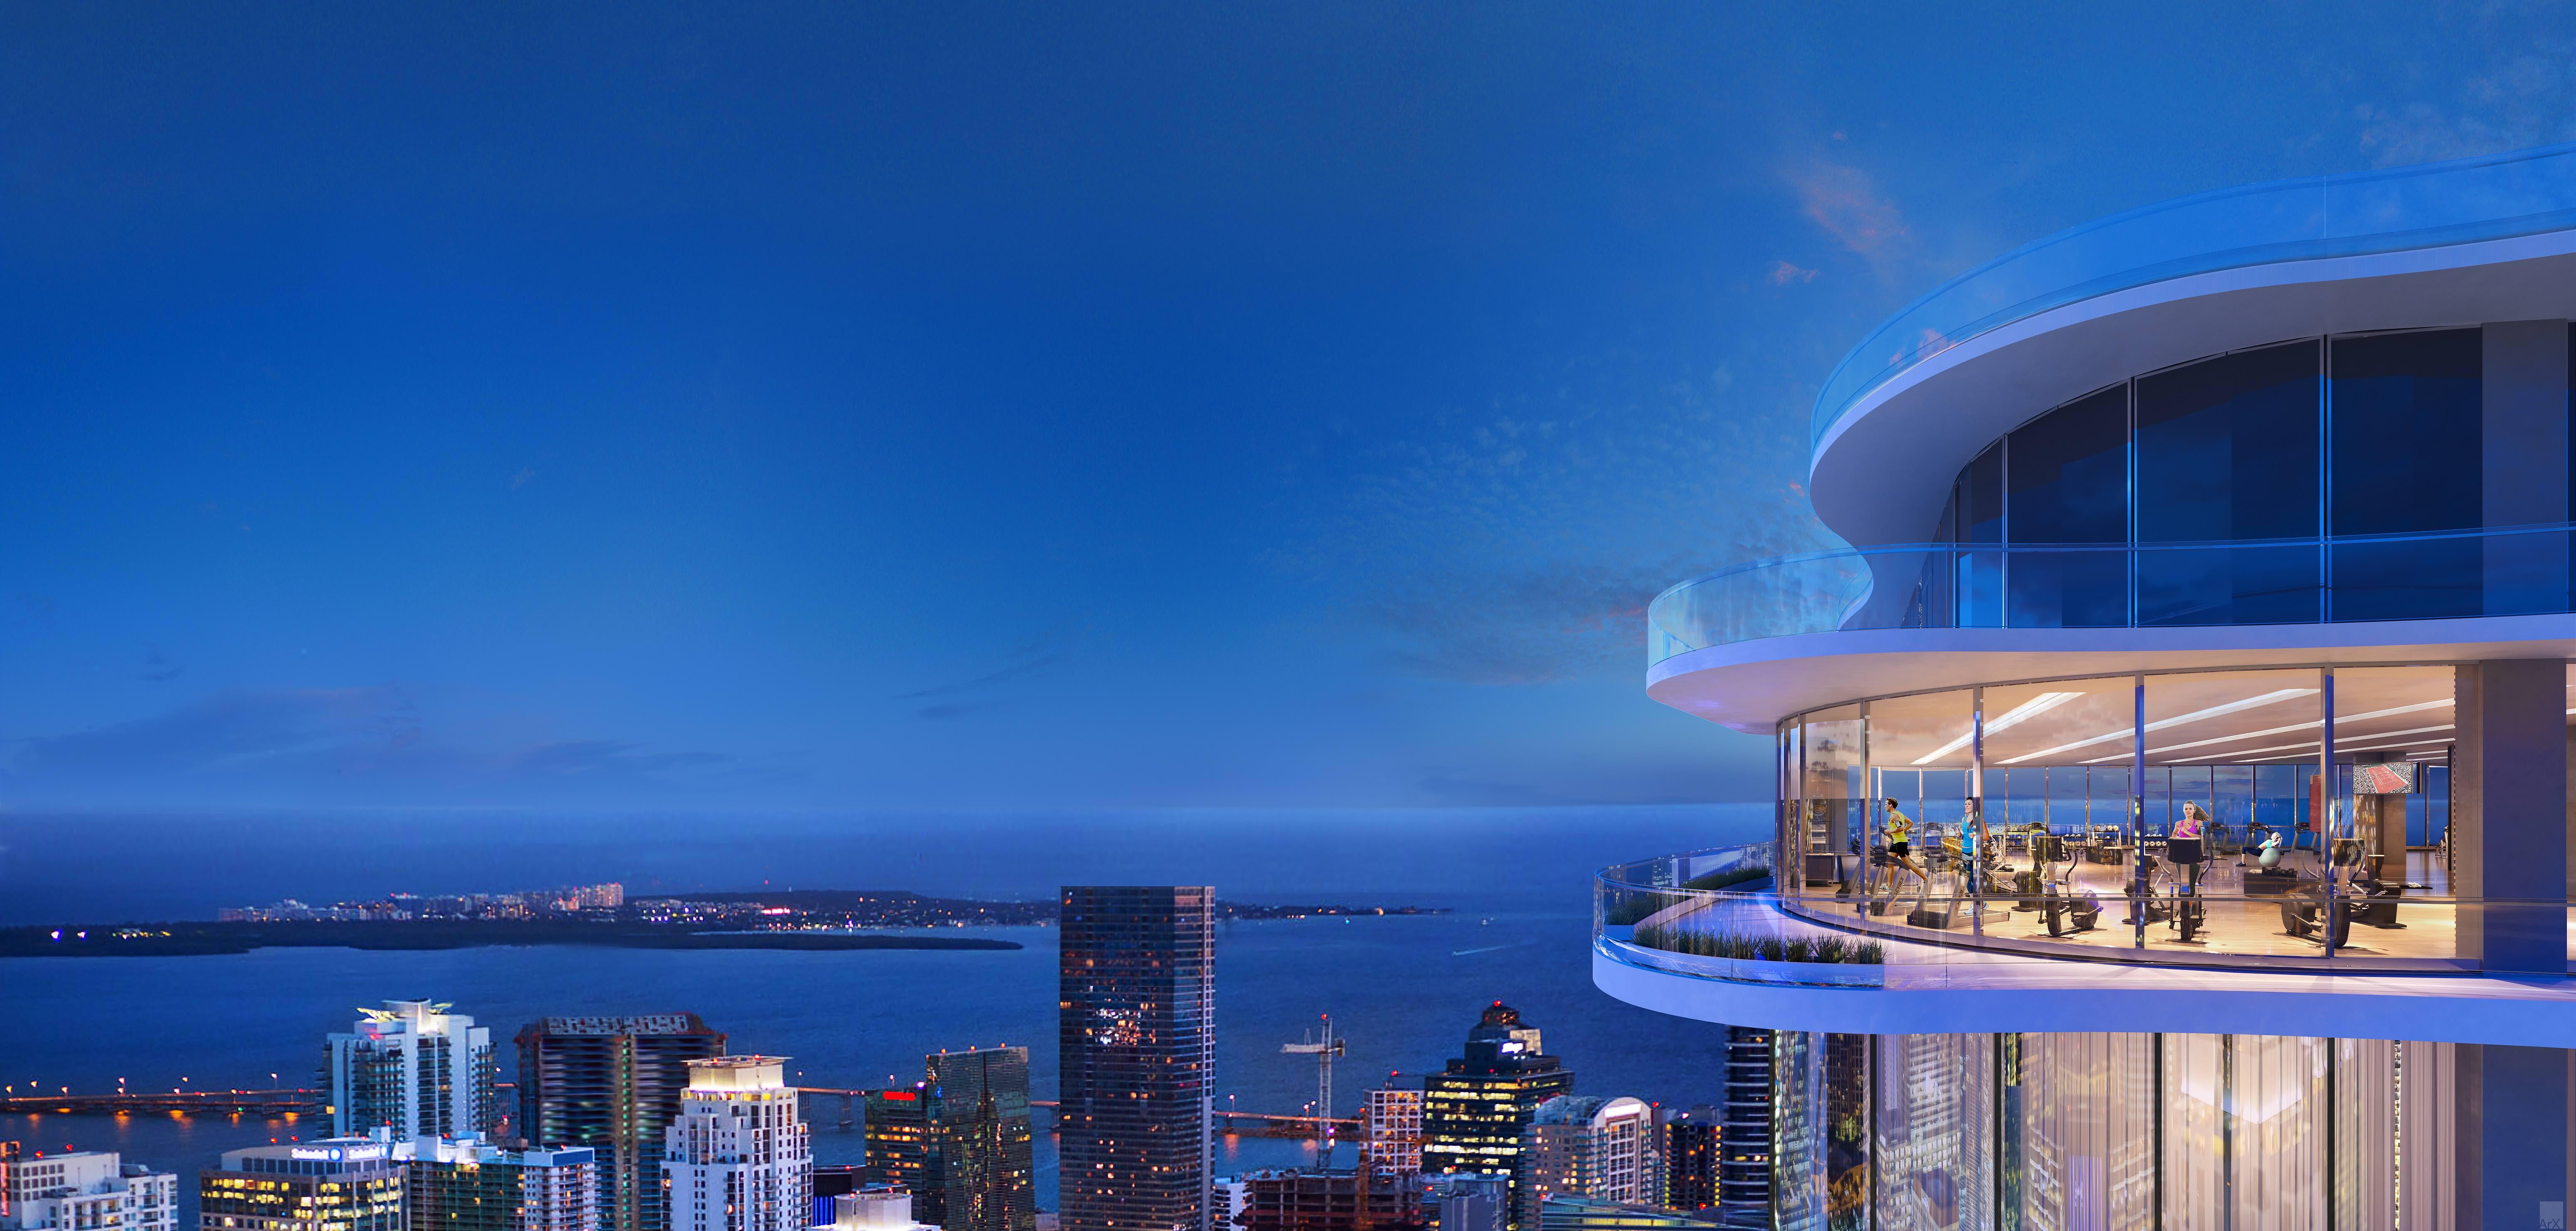 Brickell Flatiron Tallest Residential Tower in Miami